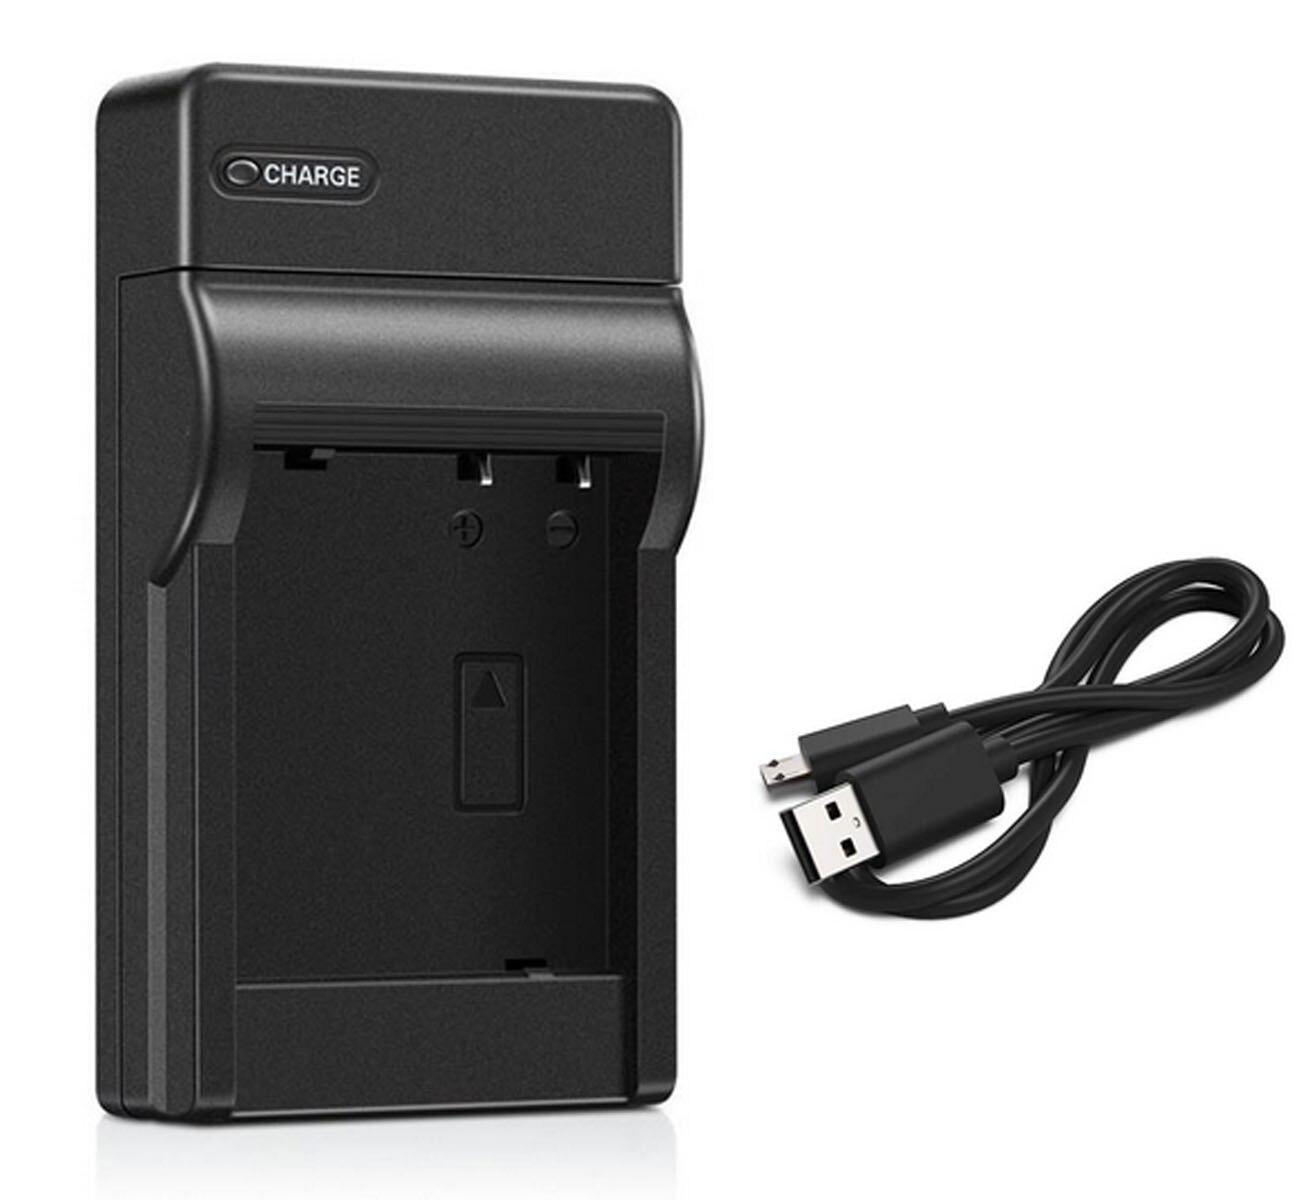 Batterie Ladegerät für Olympus Stylus Tough TG-1, TG-2, TG-3, TG-4, TG-5, TG-6, TG-Tracker, TG-610, TG-620, TG-630 iHS Digital Kamera